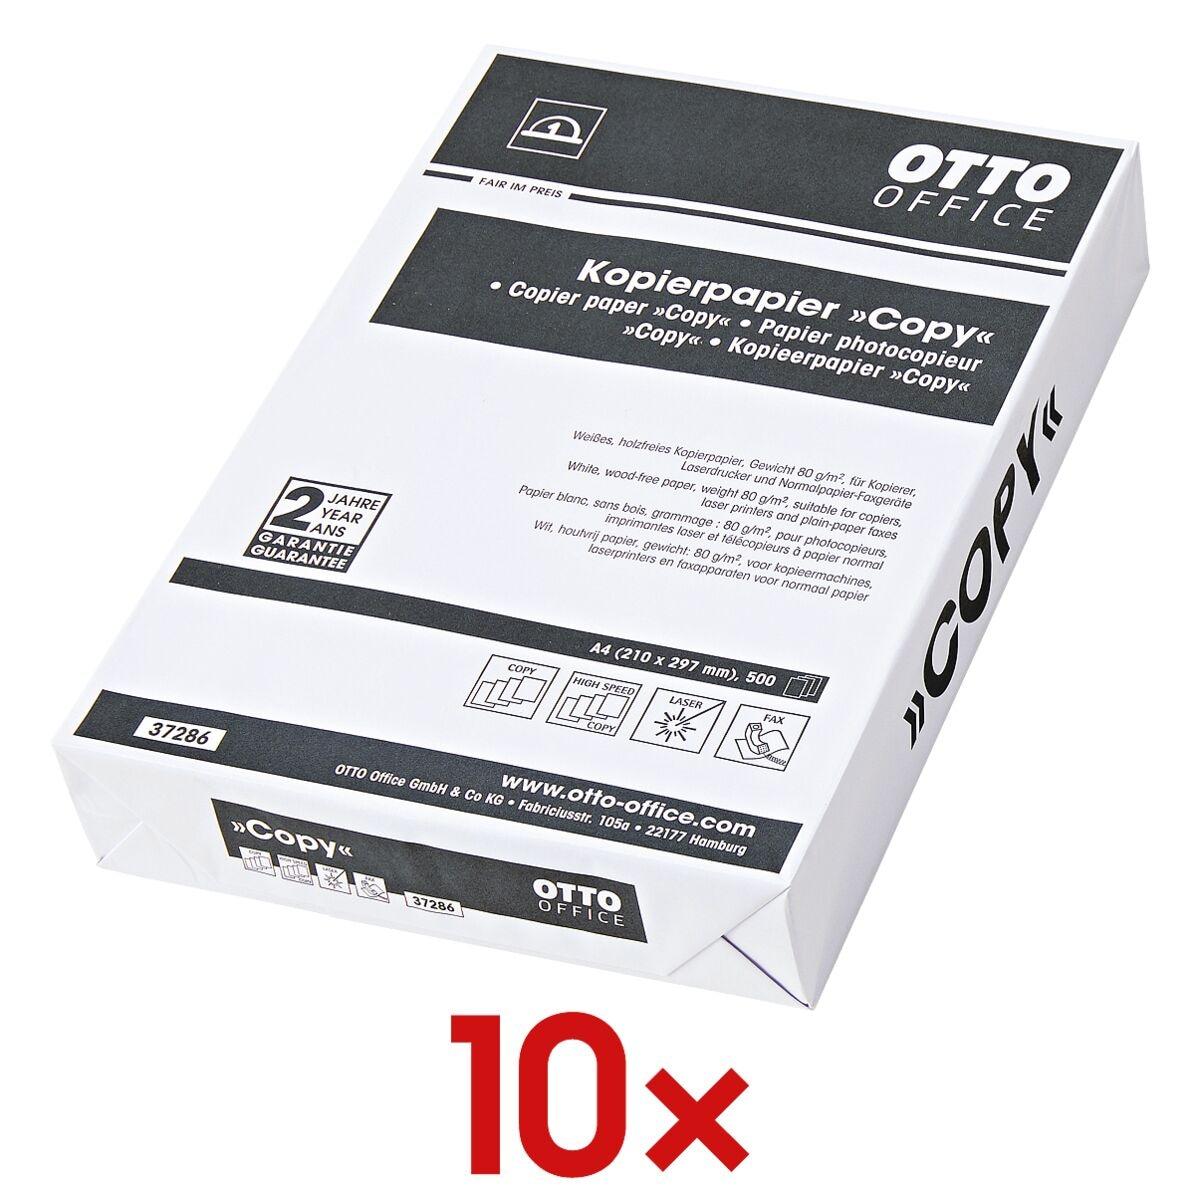 10x Kopieerpapier A4 OTTO Office Budget COPY - 5000 bladen (totaal), 80g/qm